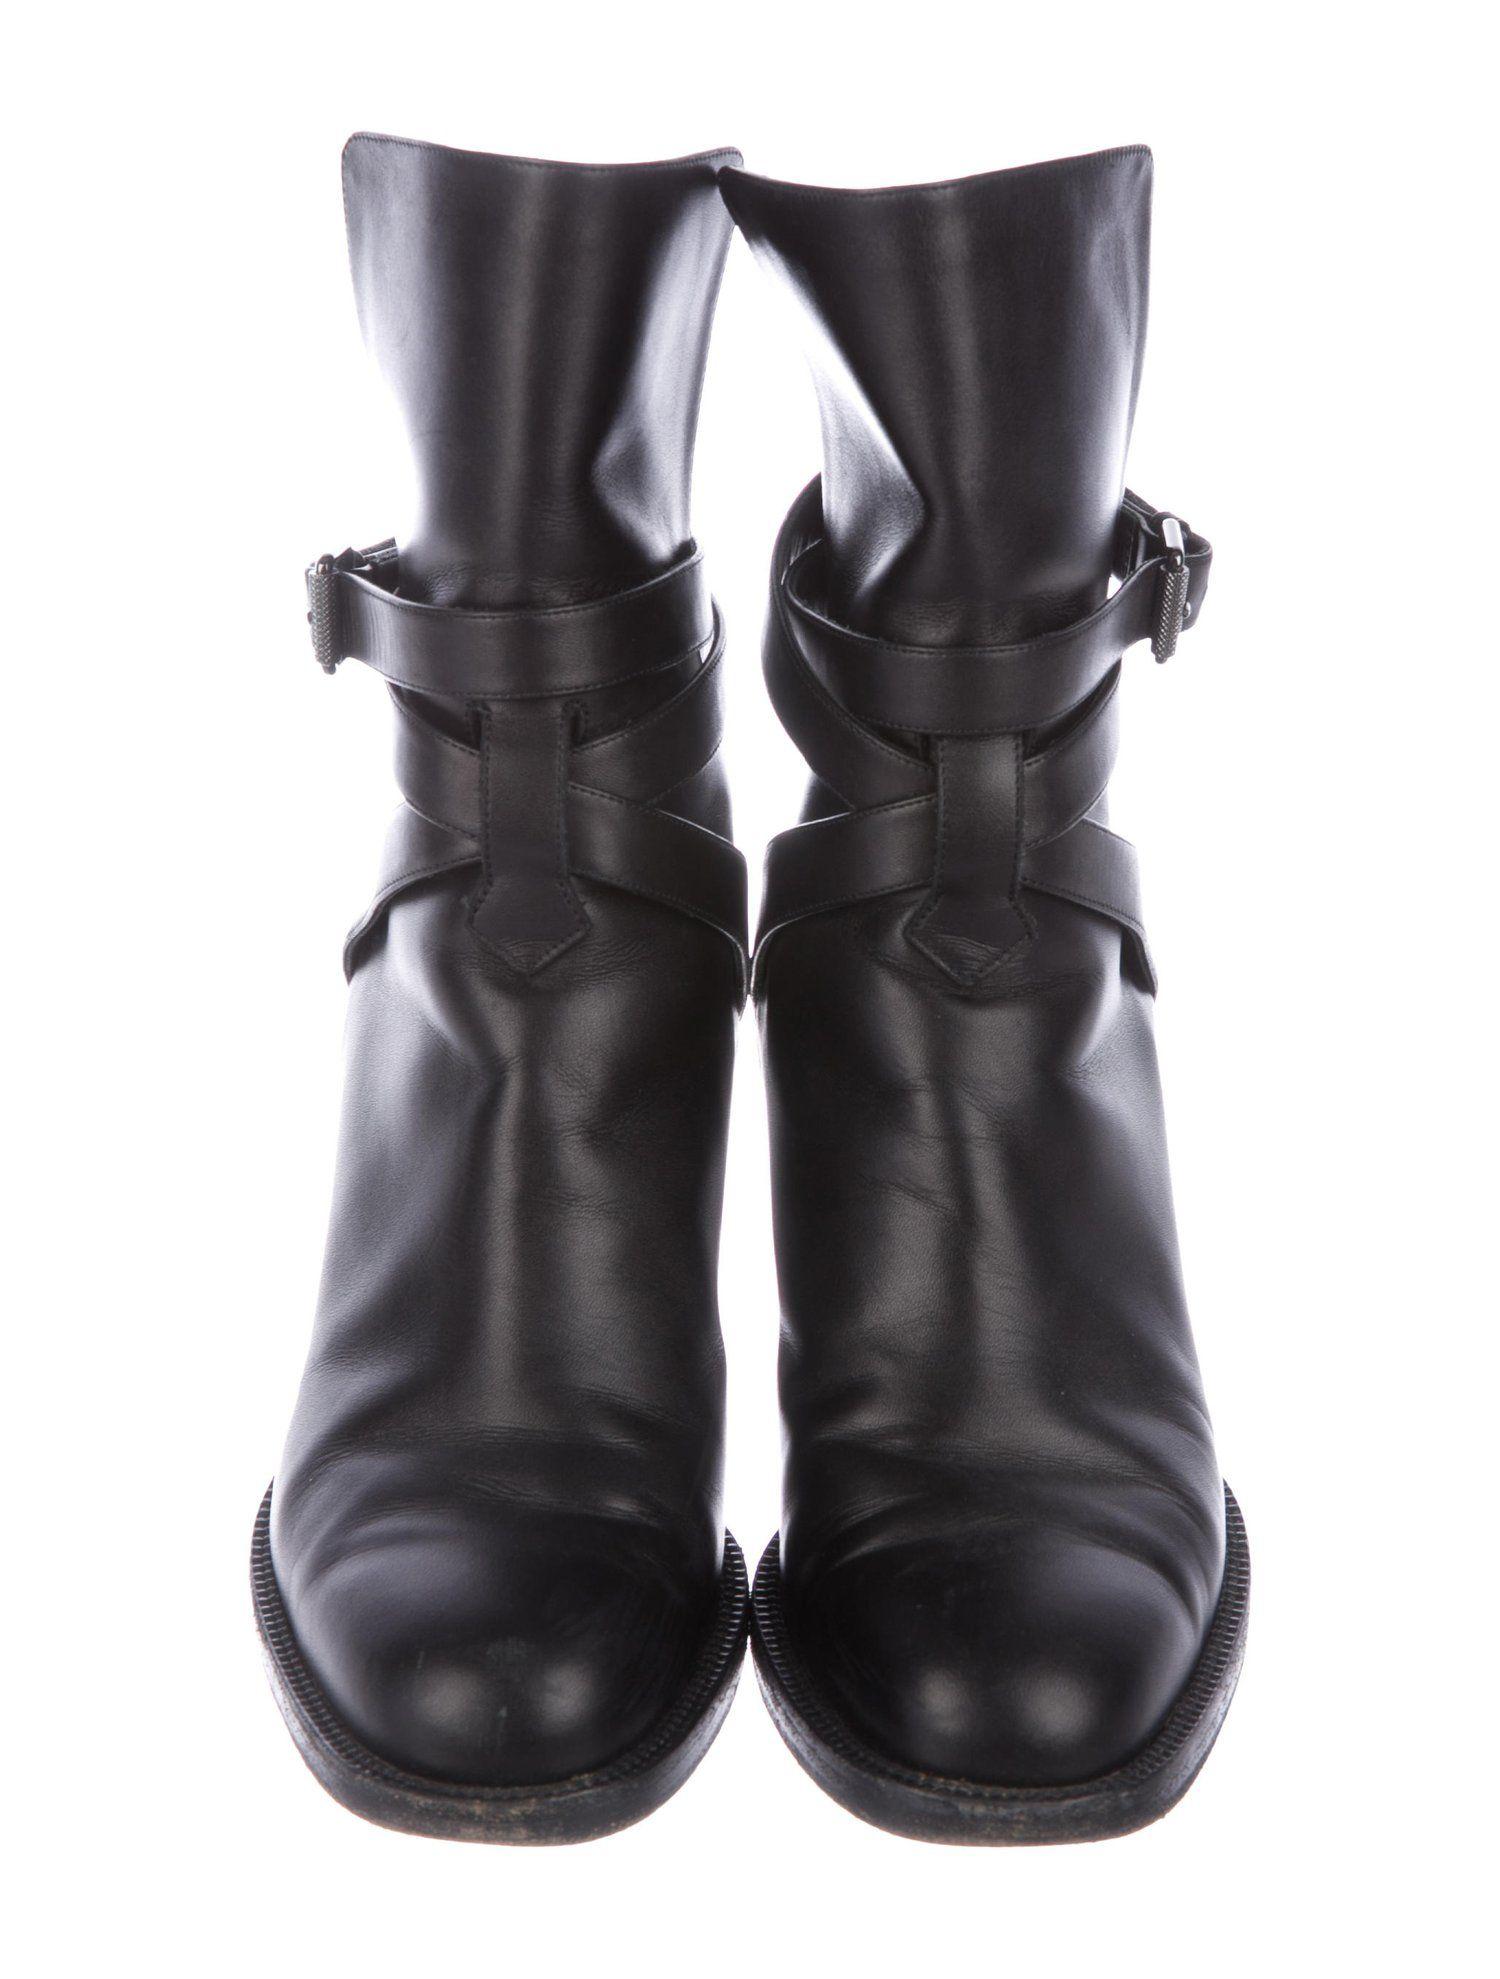 533528f969c Christian Louboutin Karistrap Leather Boots #SPONSORED #Louboutin ...